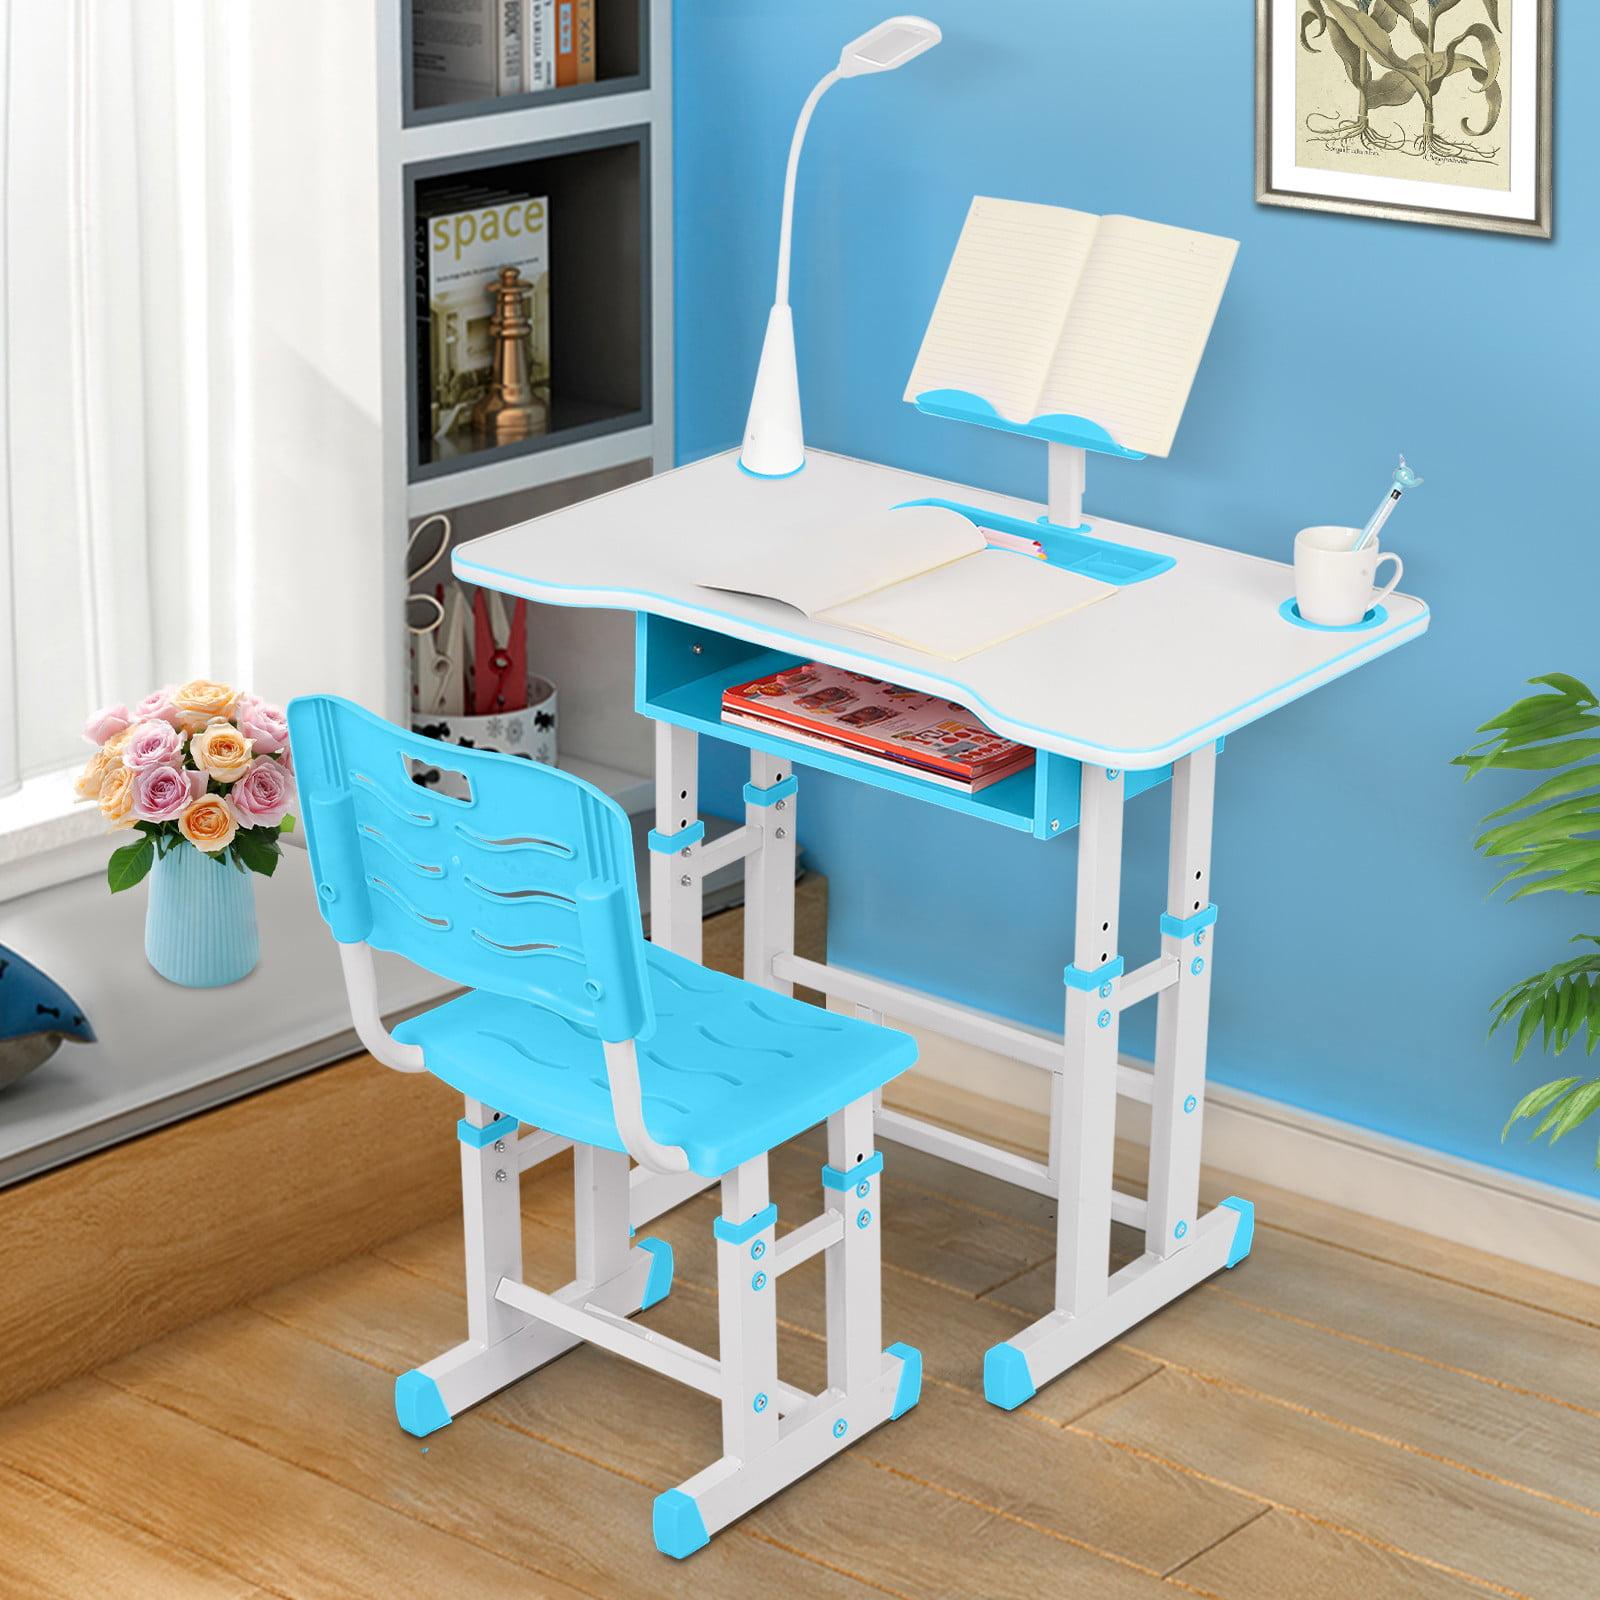 children's study desk and chair set